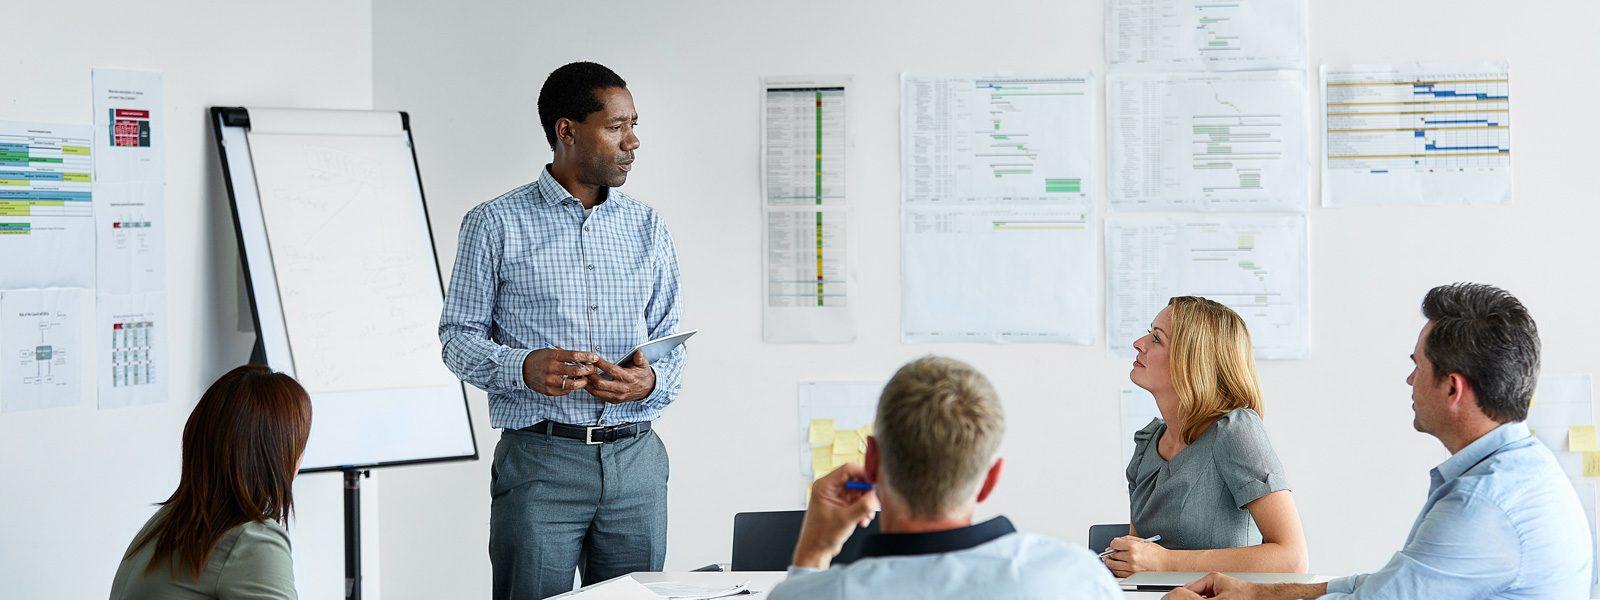 presentation skills communication training perfect pitch